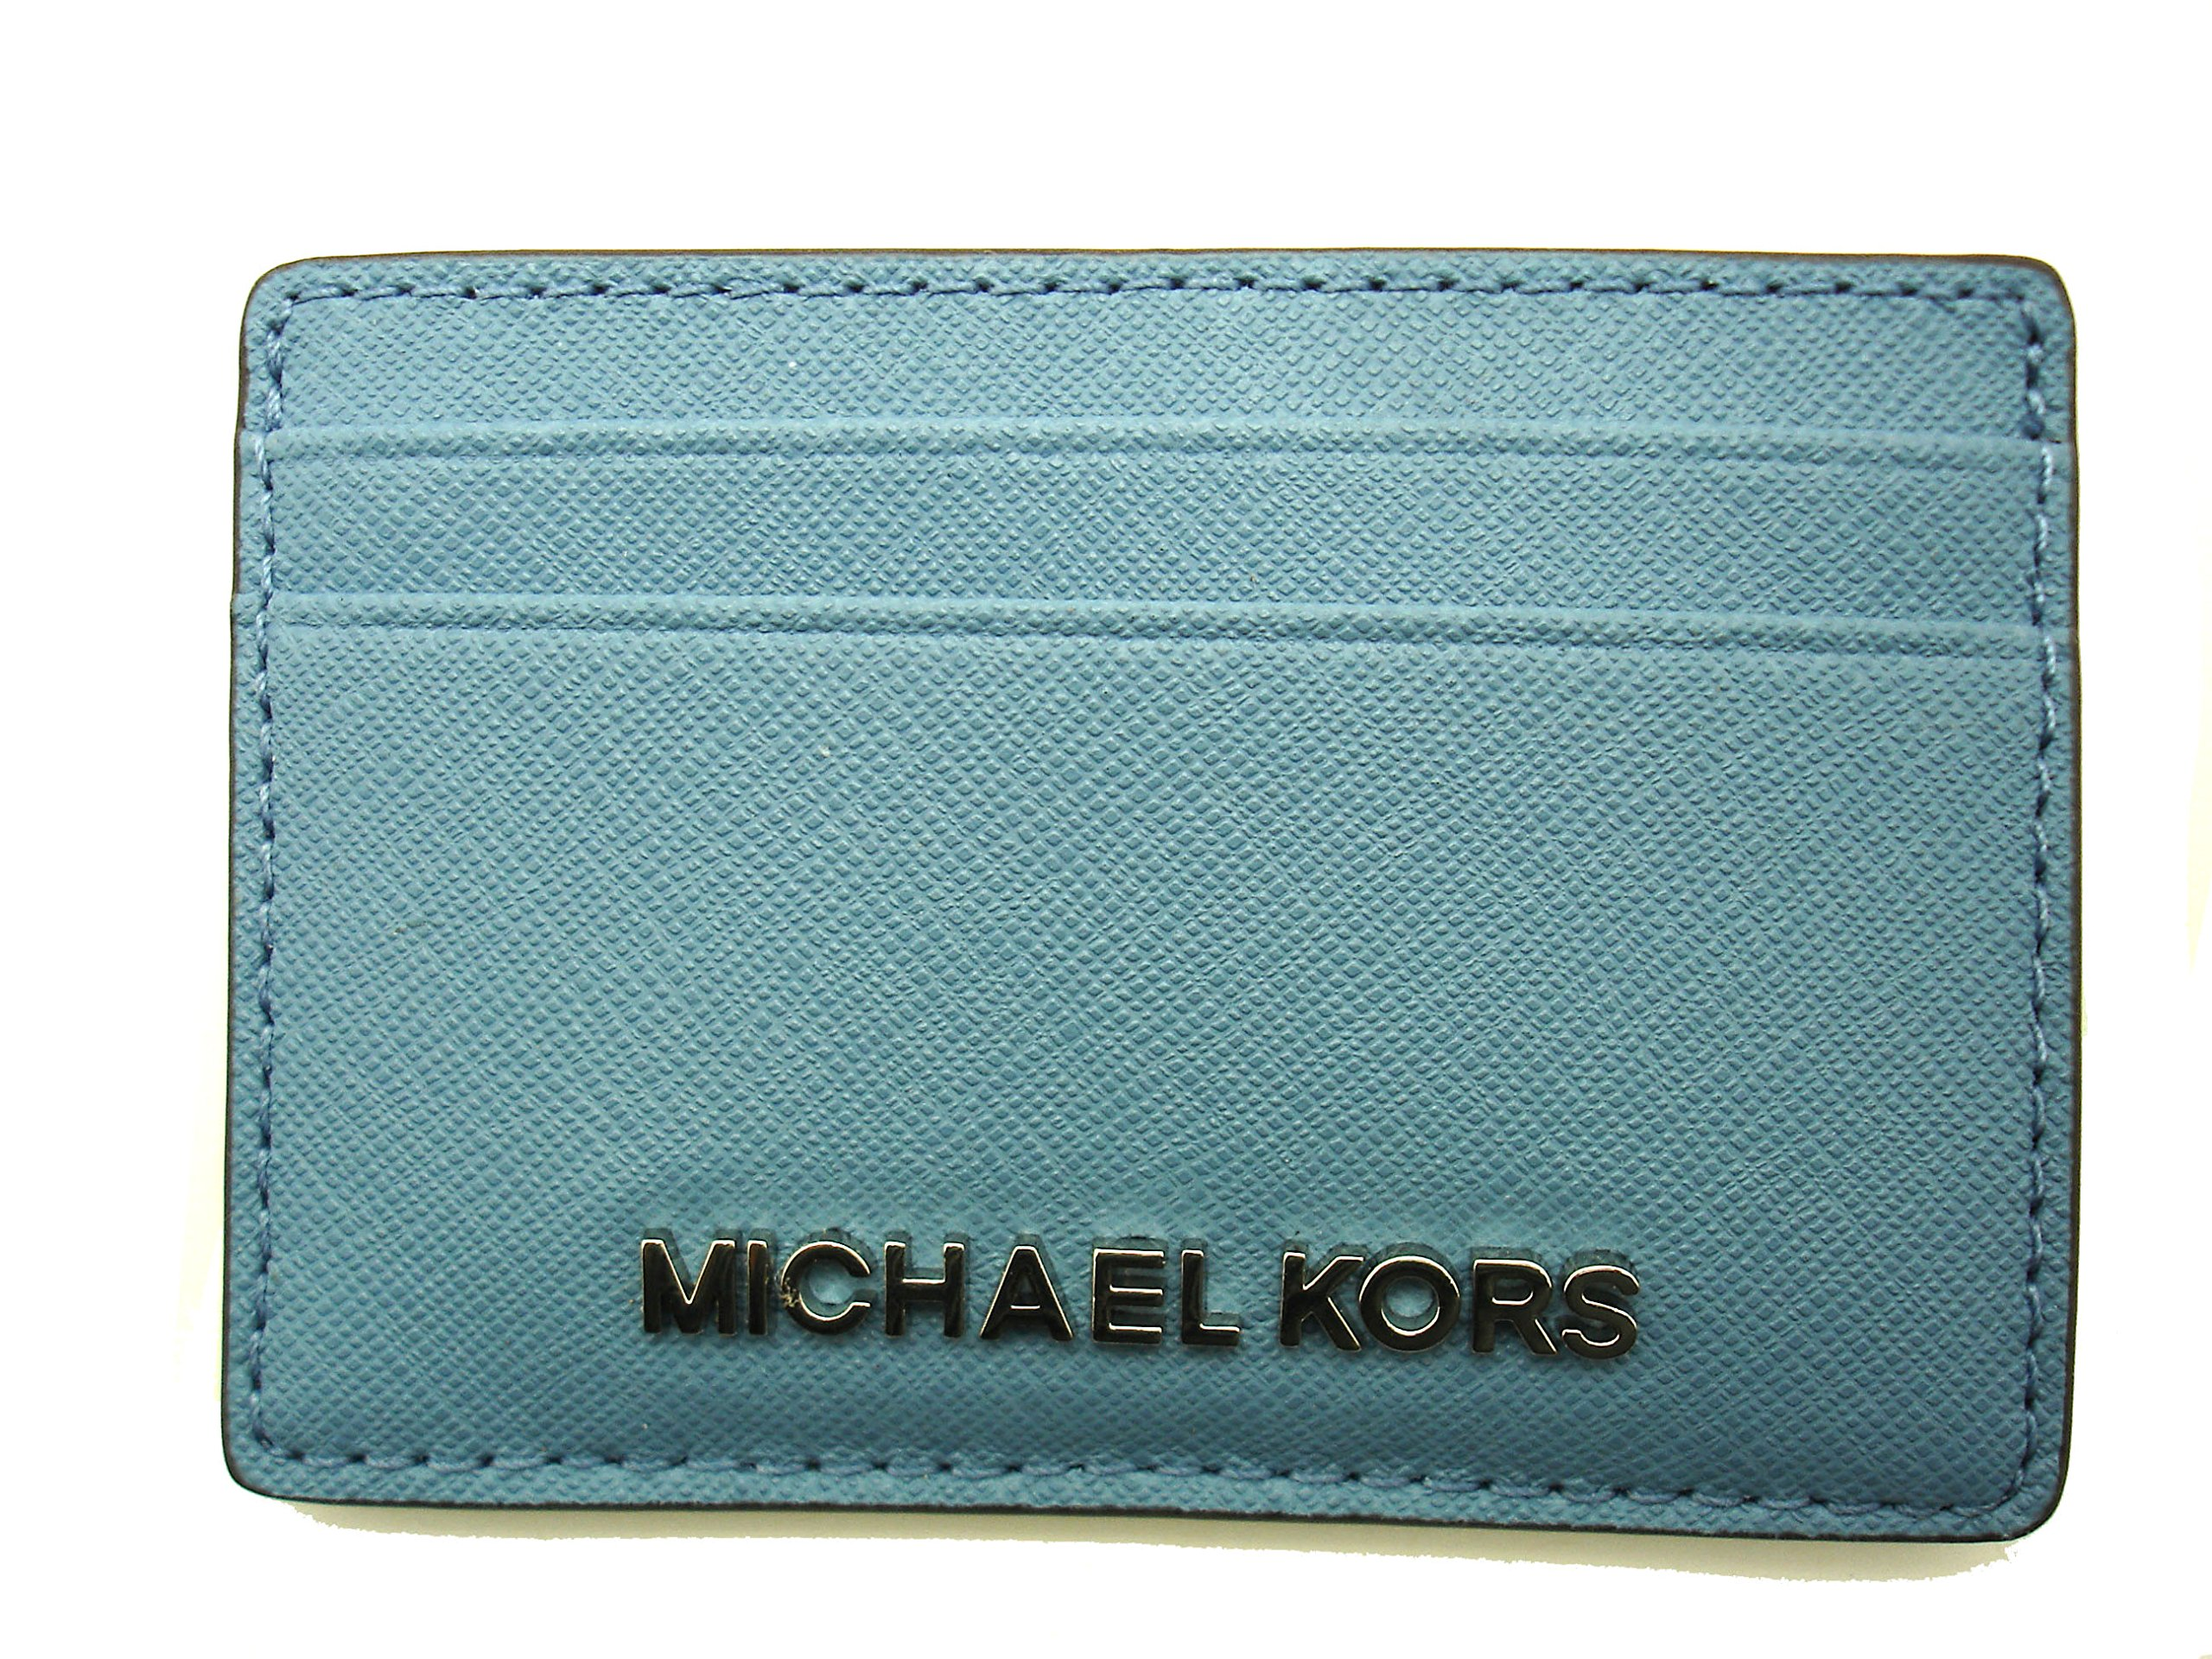 Michael Kors Jet Set ID Card Case Holder Saffiano Leather Sky